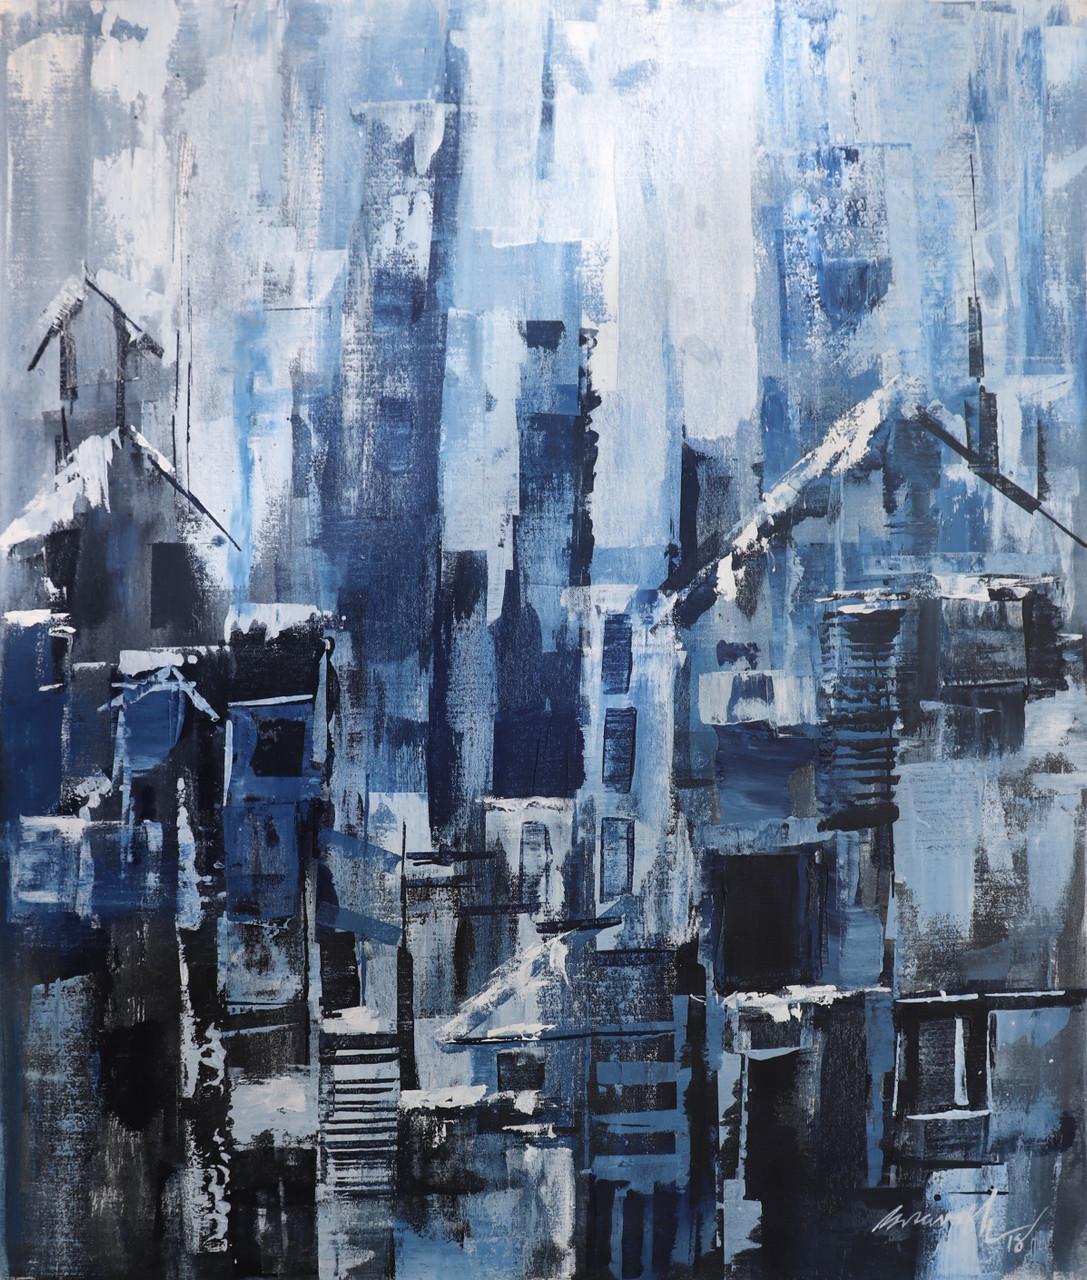 Winter season (ART_1380_39796) - Handpainted Art Painting - 38in X 45in